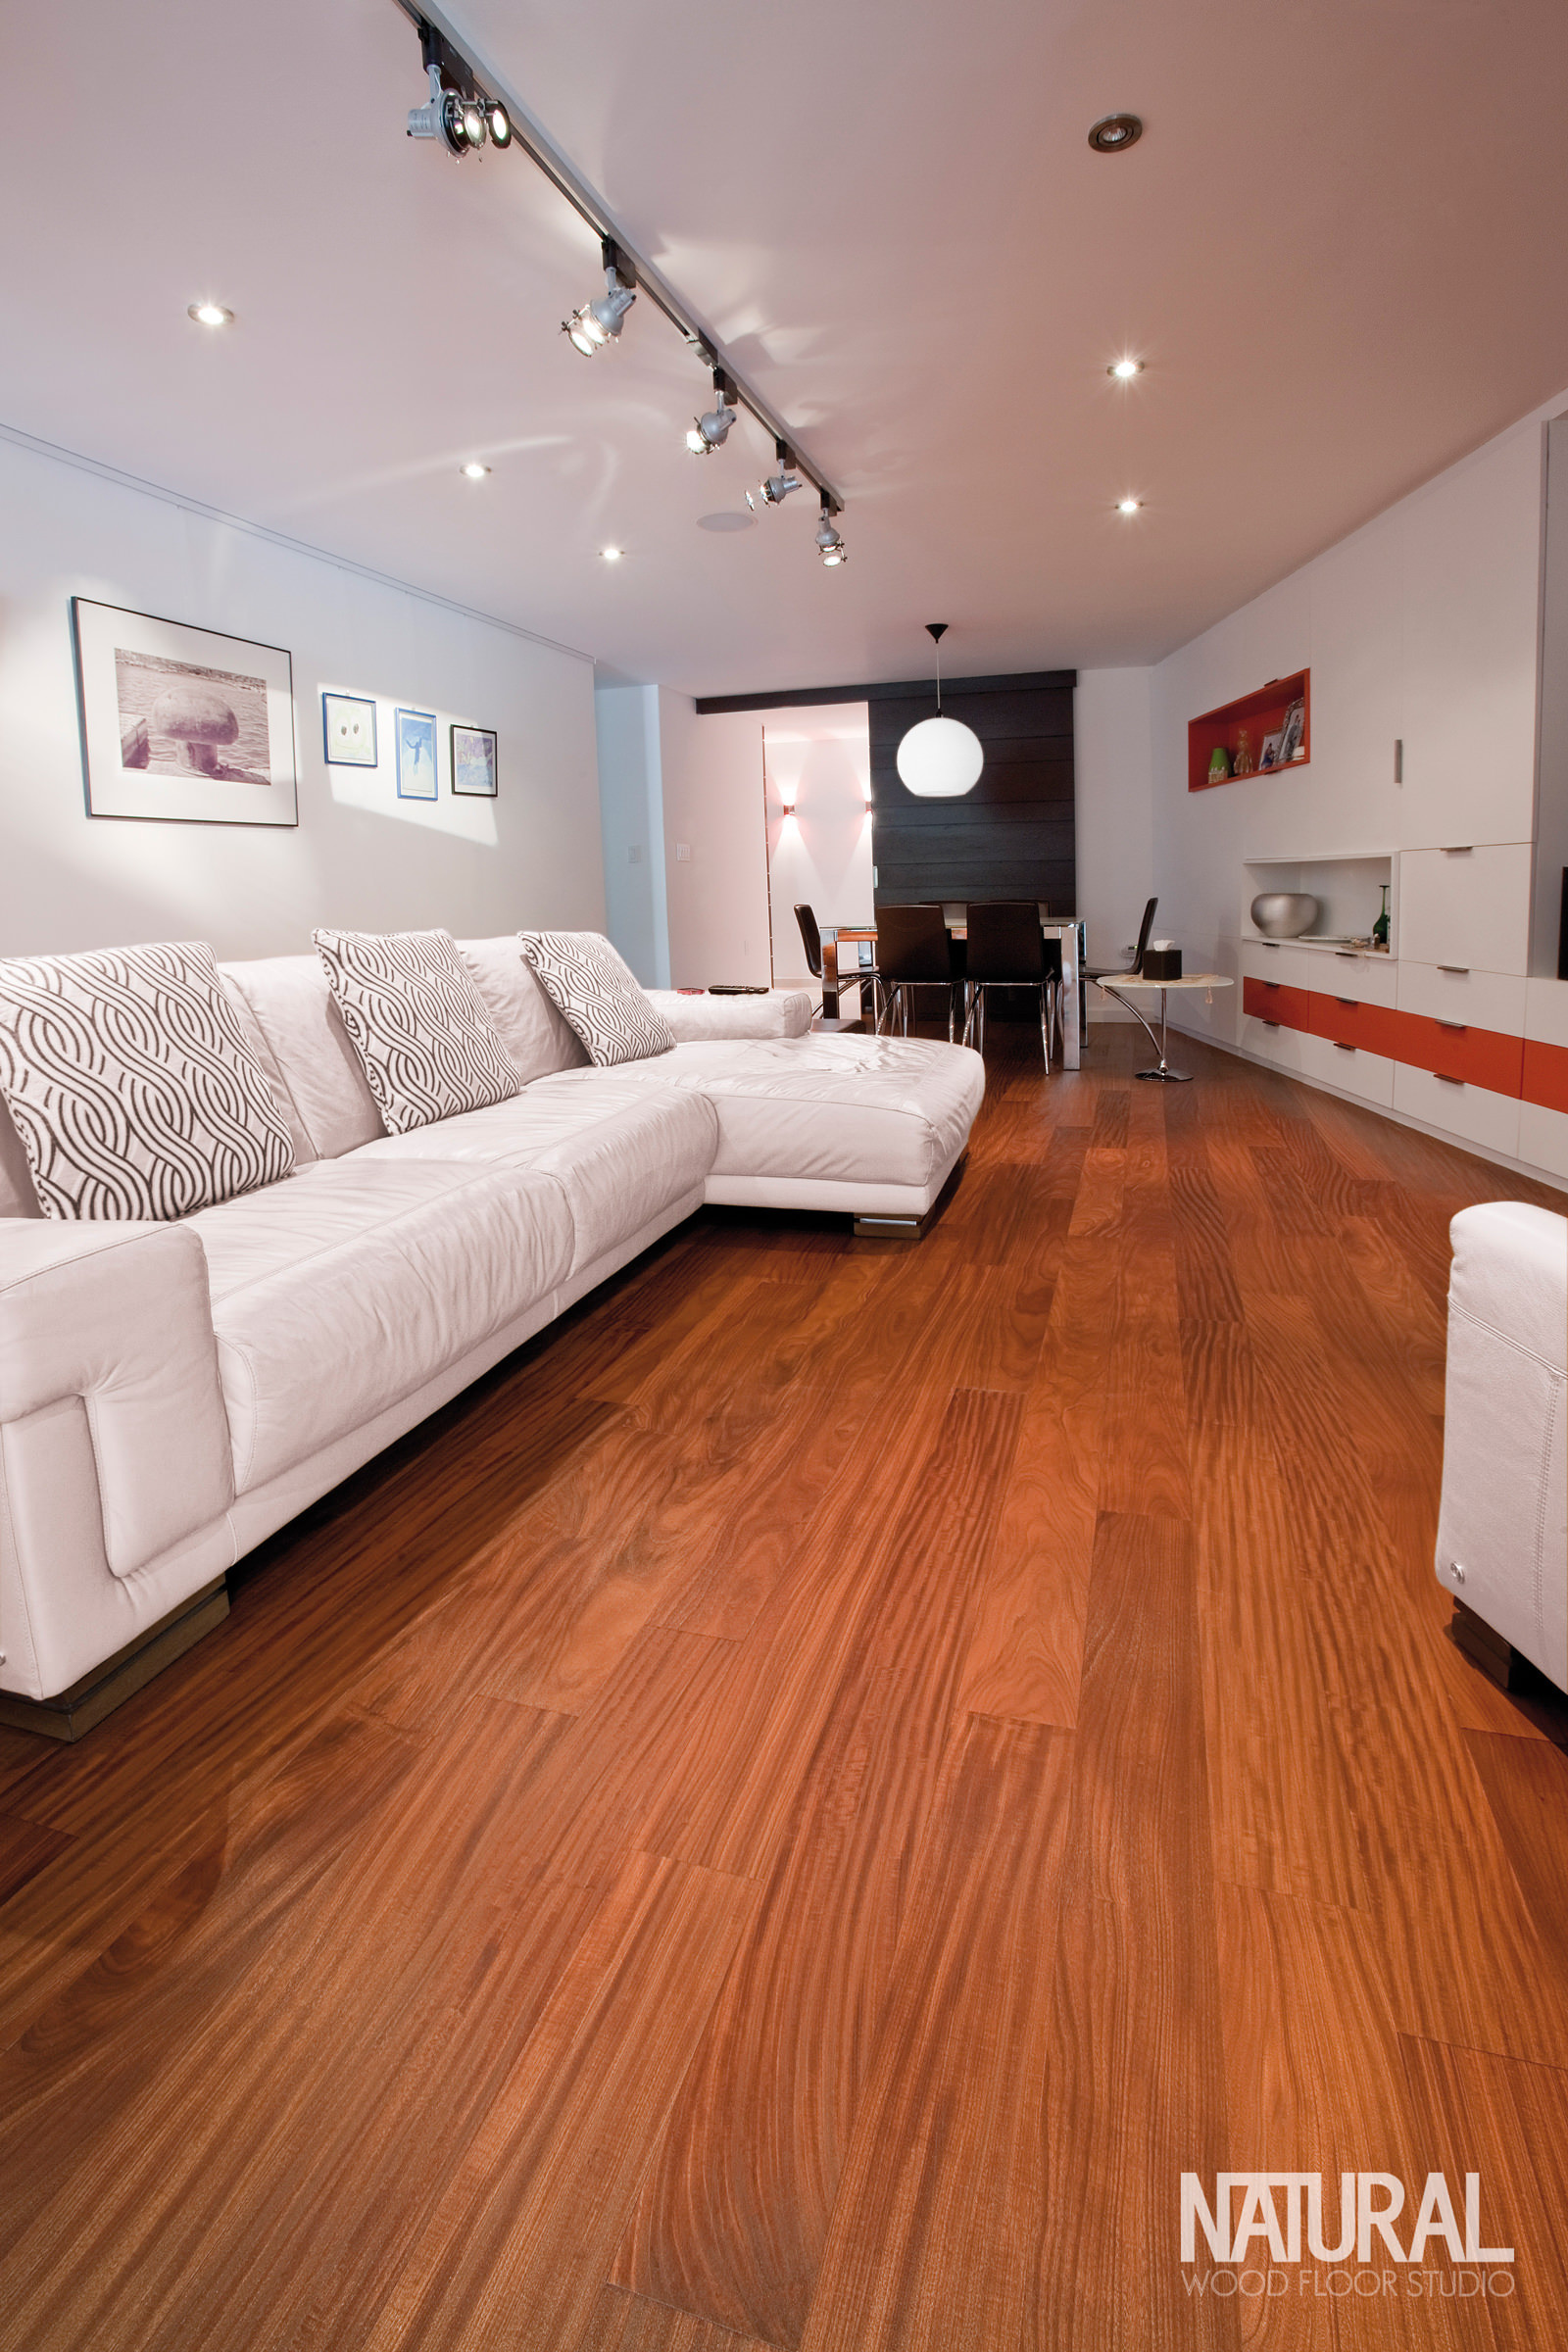 best mop for hardwood floors 2015 of natural wood floor studio the fine art of wood floors with design a 2016 natural wood floor studio all rights reserved